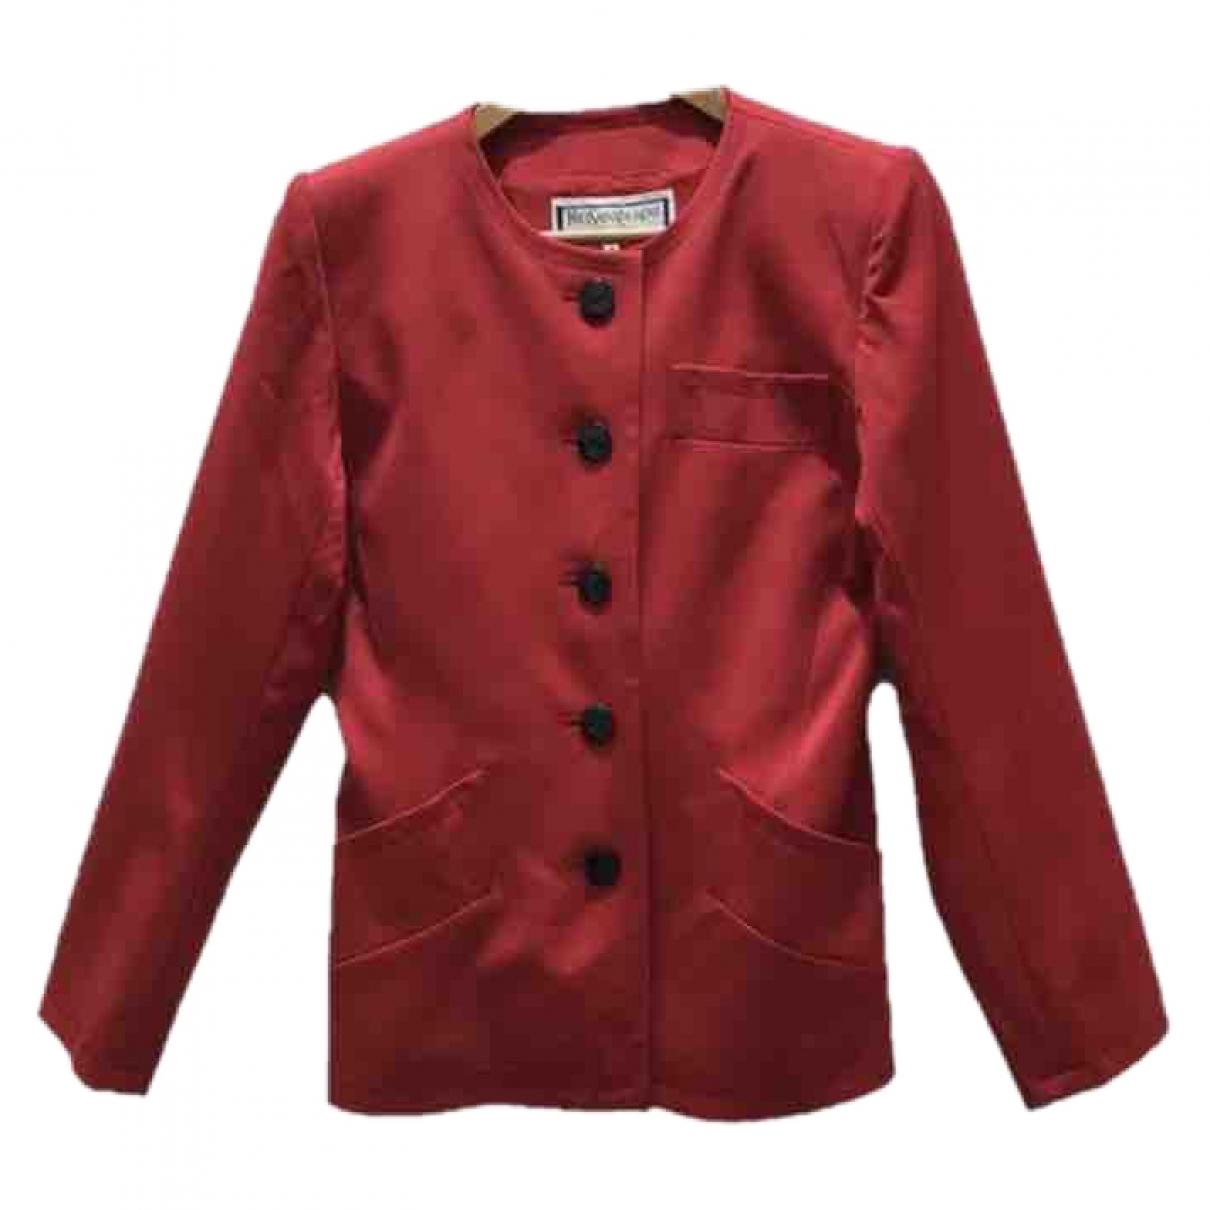 Yves Saint Laurent \N Red Wool jacket for Women S International